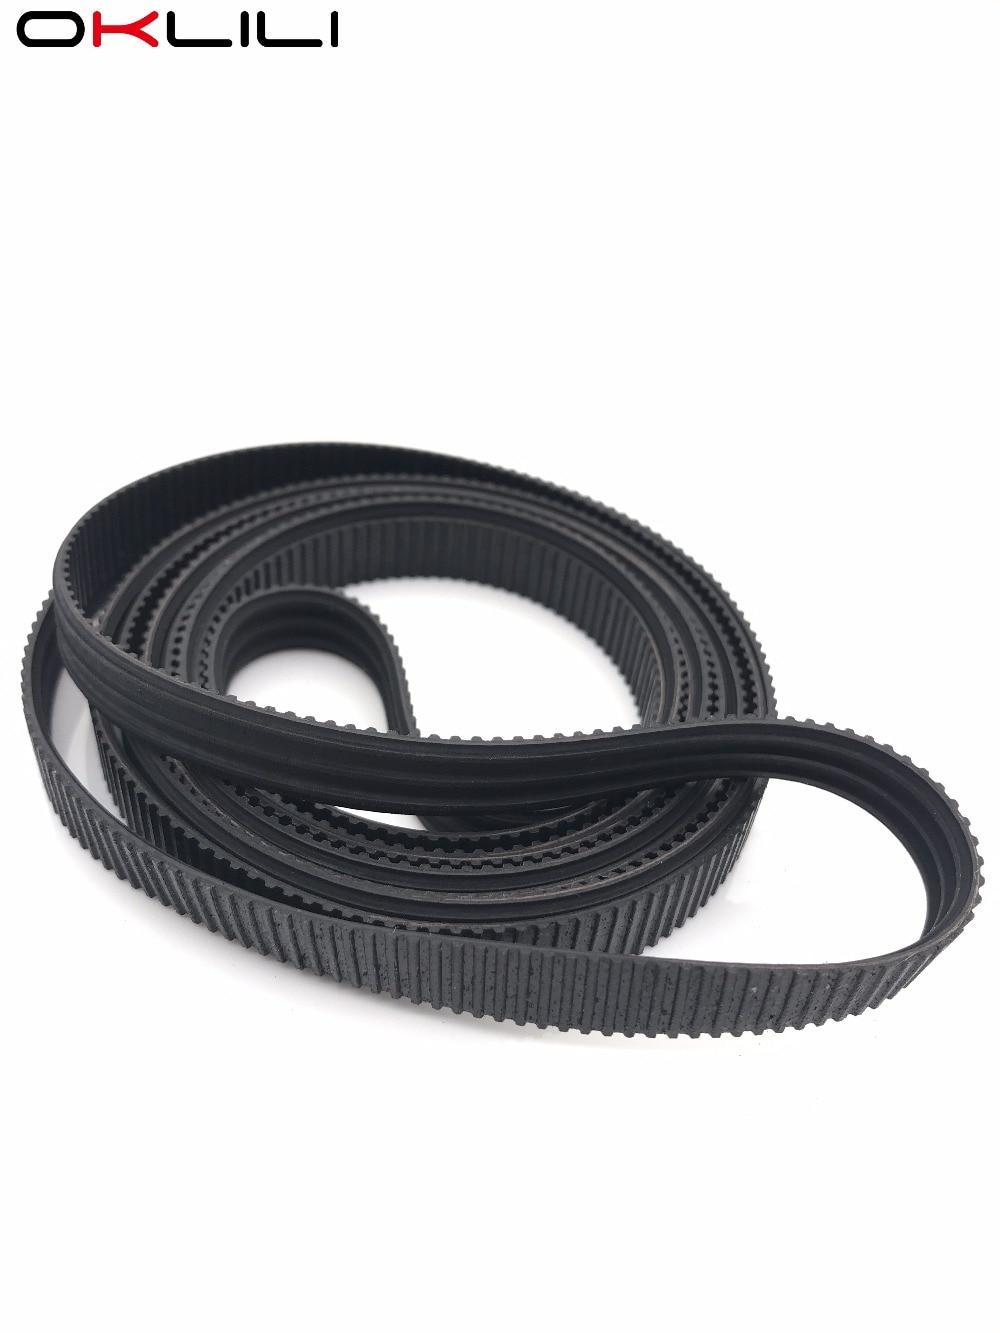 C4705-60082 Carriage Belt 24/'/' for HP DesignJet 230 250c 330 350c 430 450c